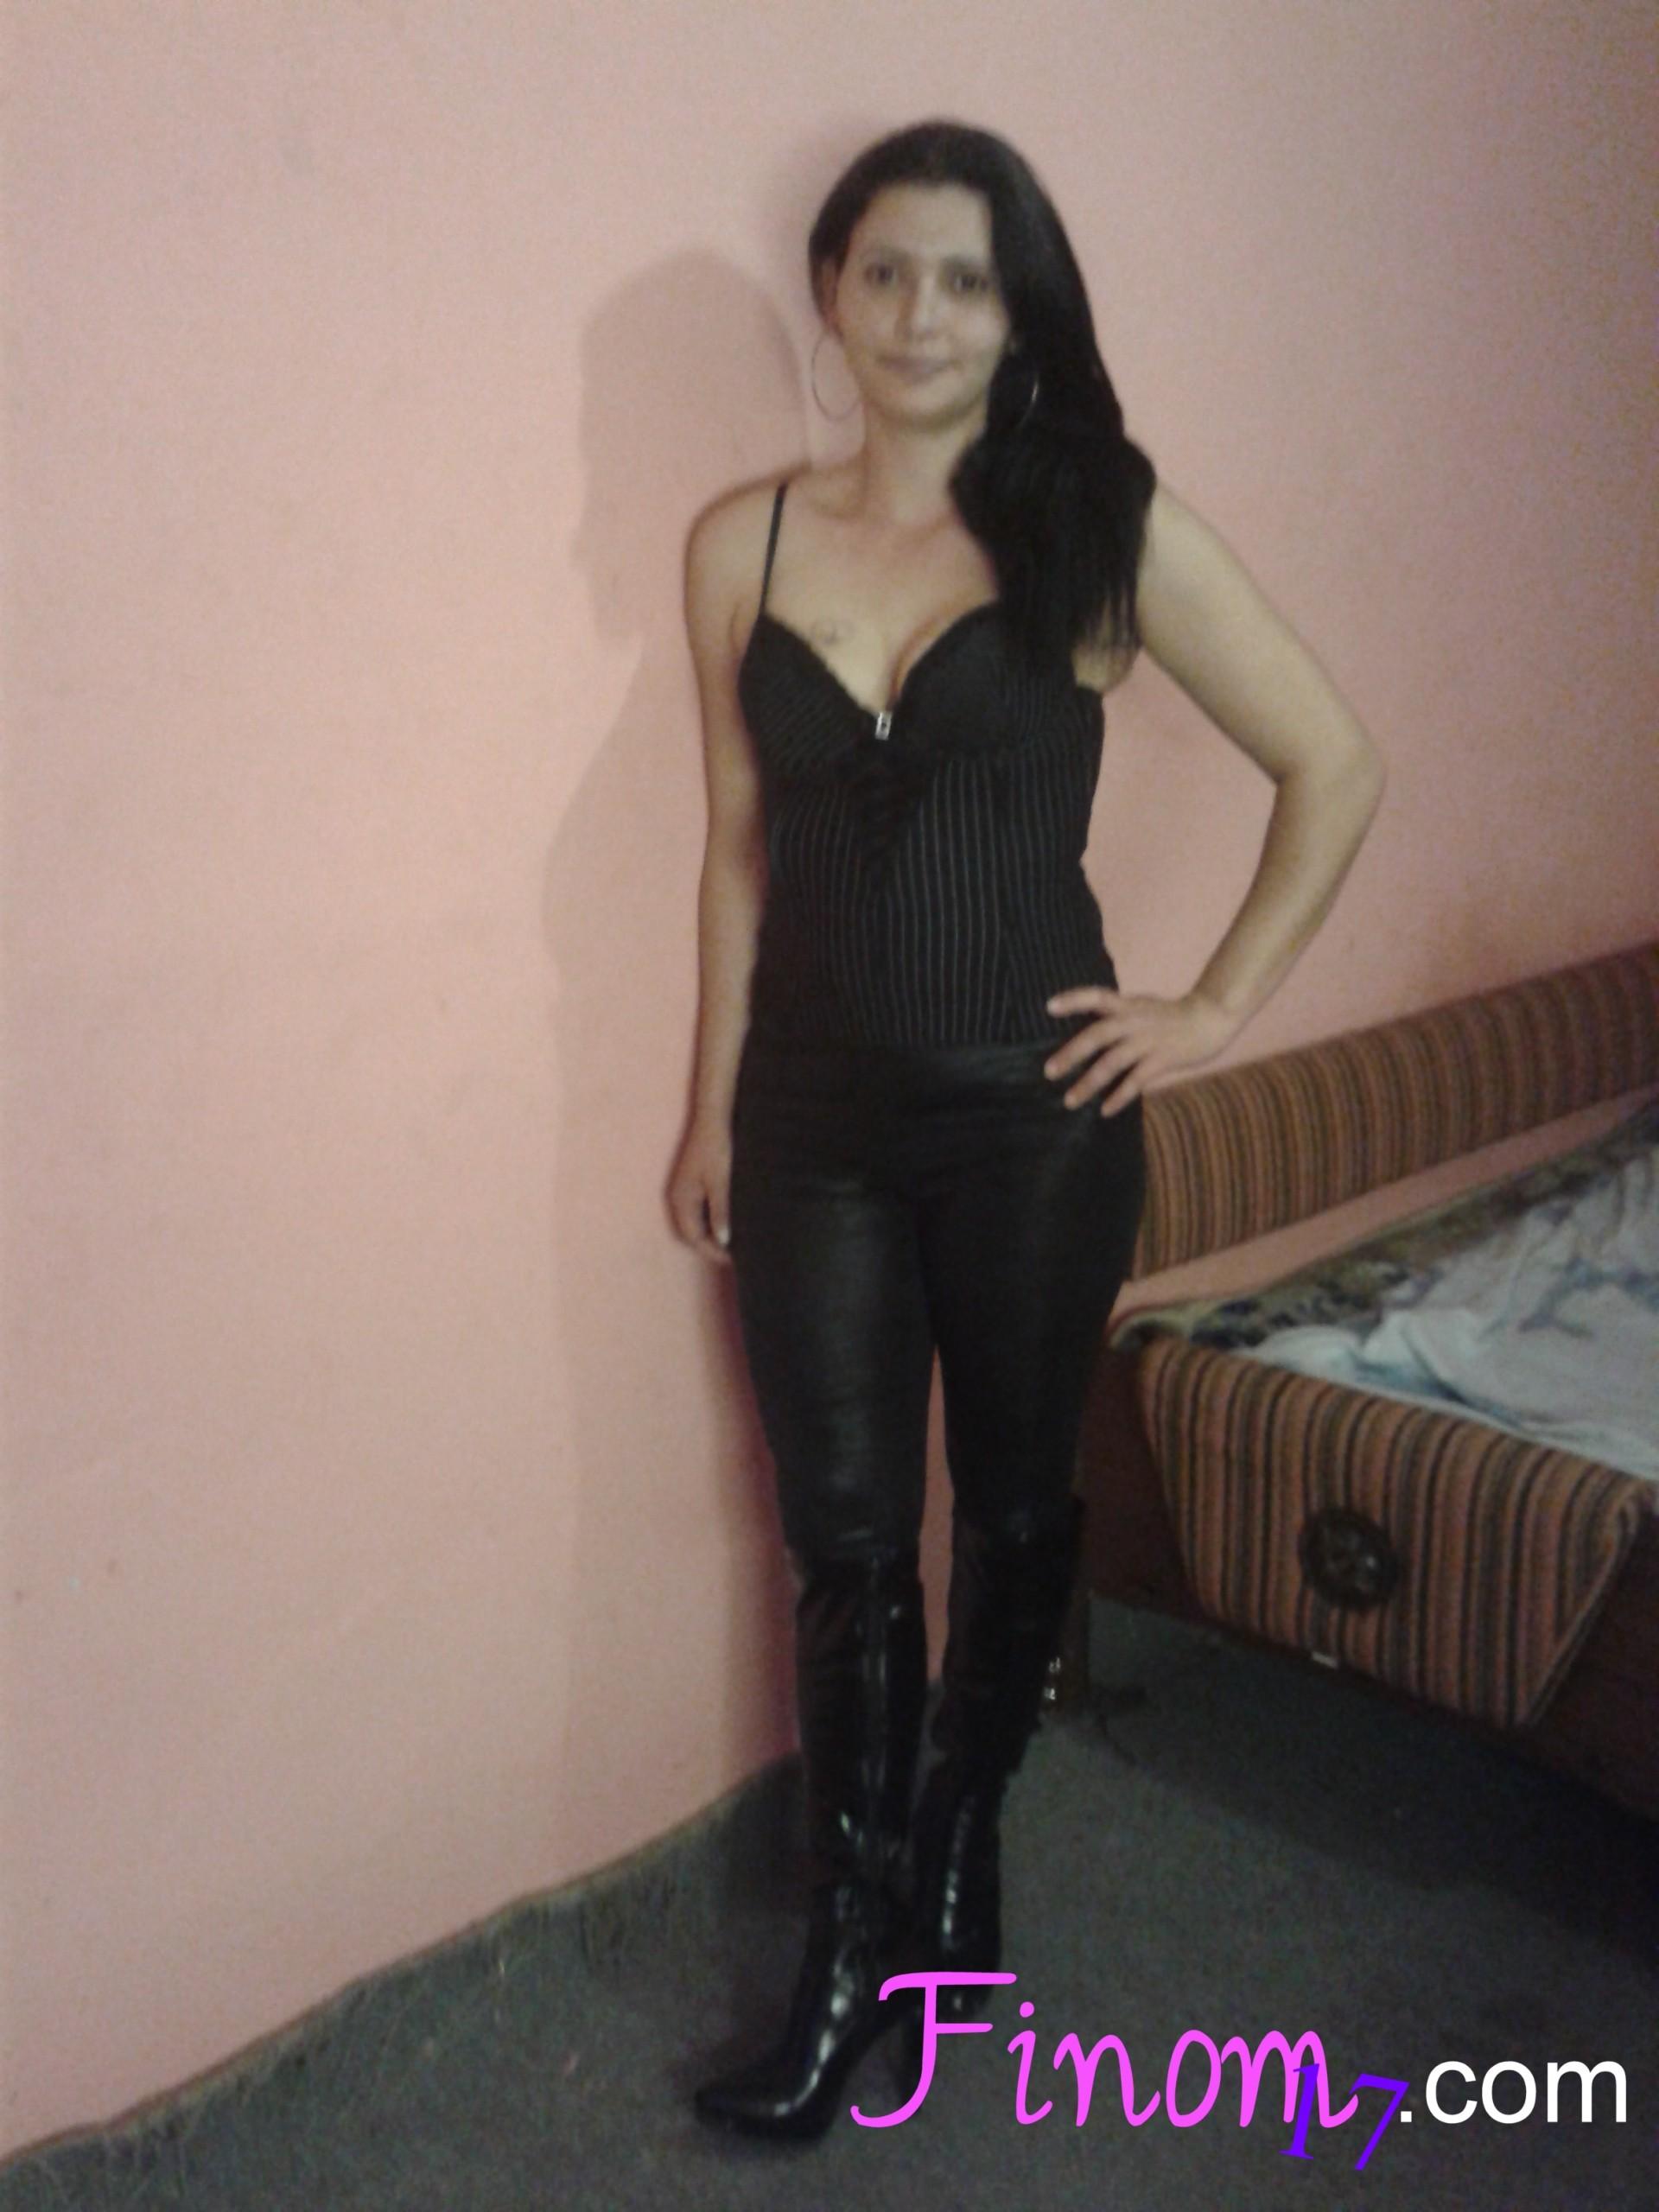 rubina26 - eroticmassage